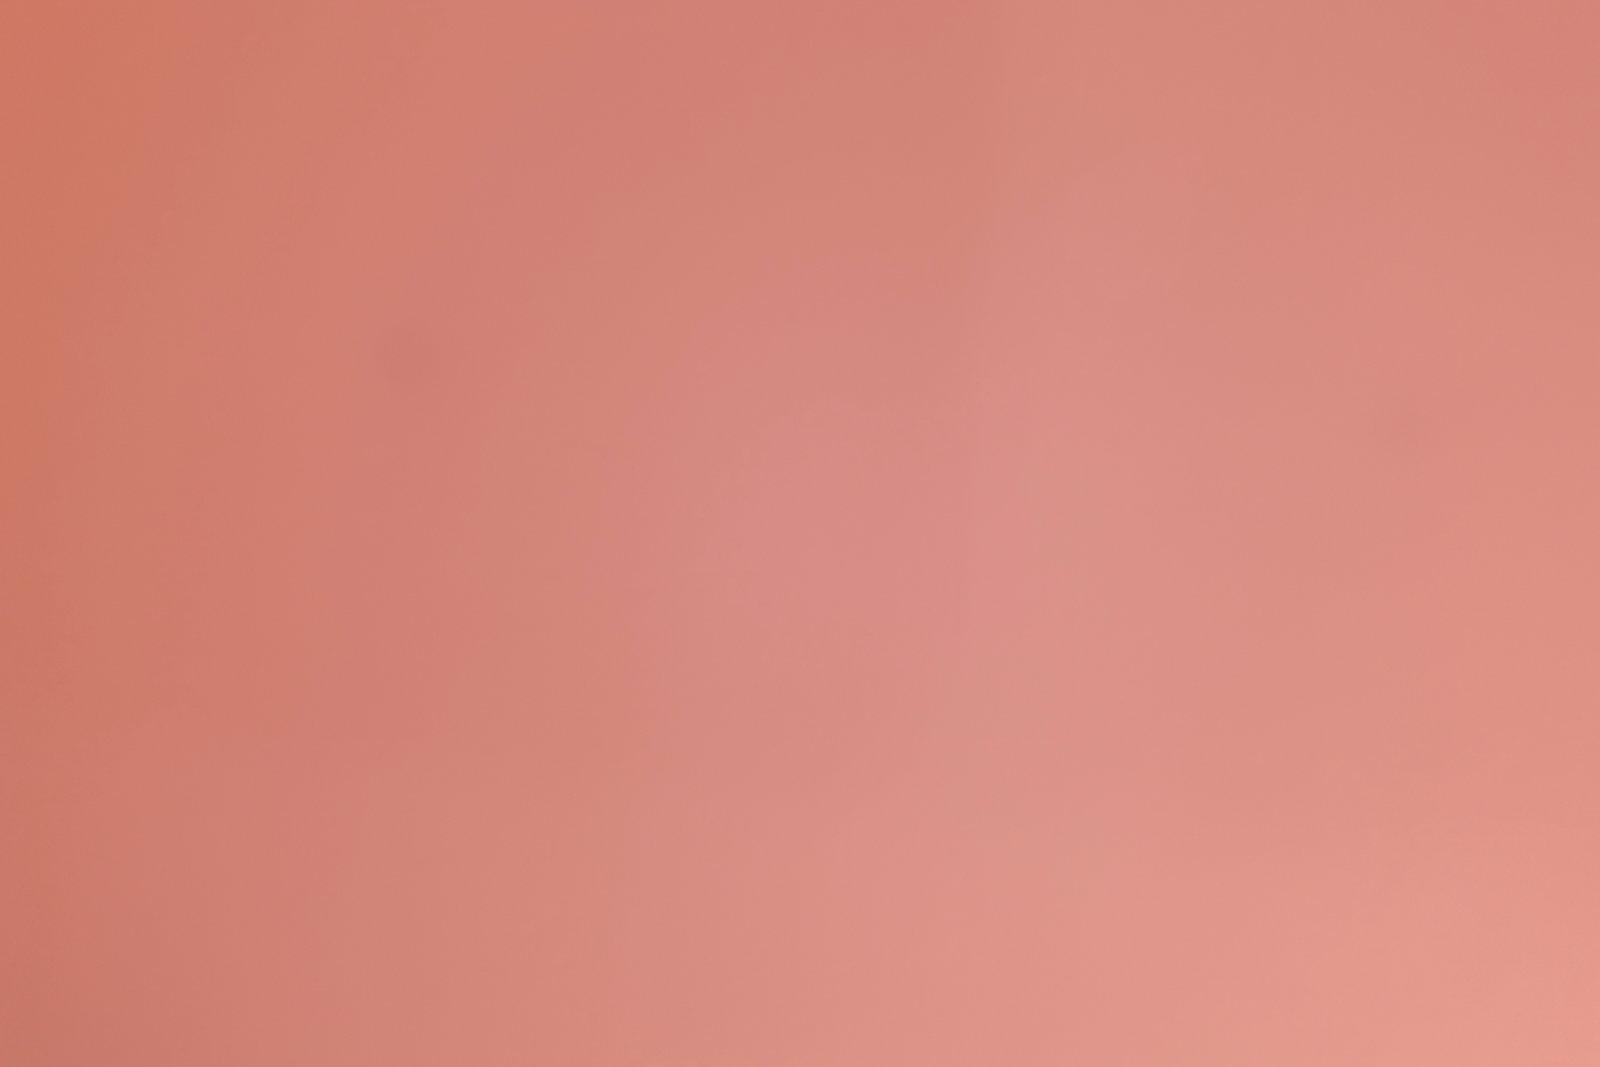 test infrarouge HOTSPOT 24mm F5.6 CANON | Pierre-Louis Ferrer | Test du SIGMA 24mm F/1.4 DG HSM Art en photographie infrarouge | Partie 1